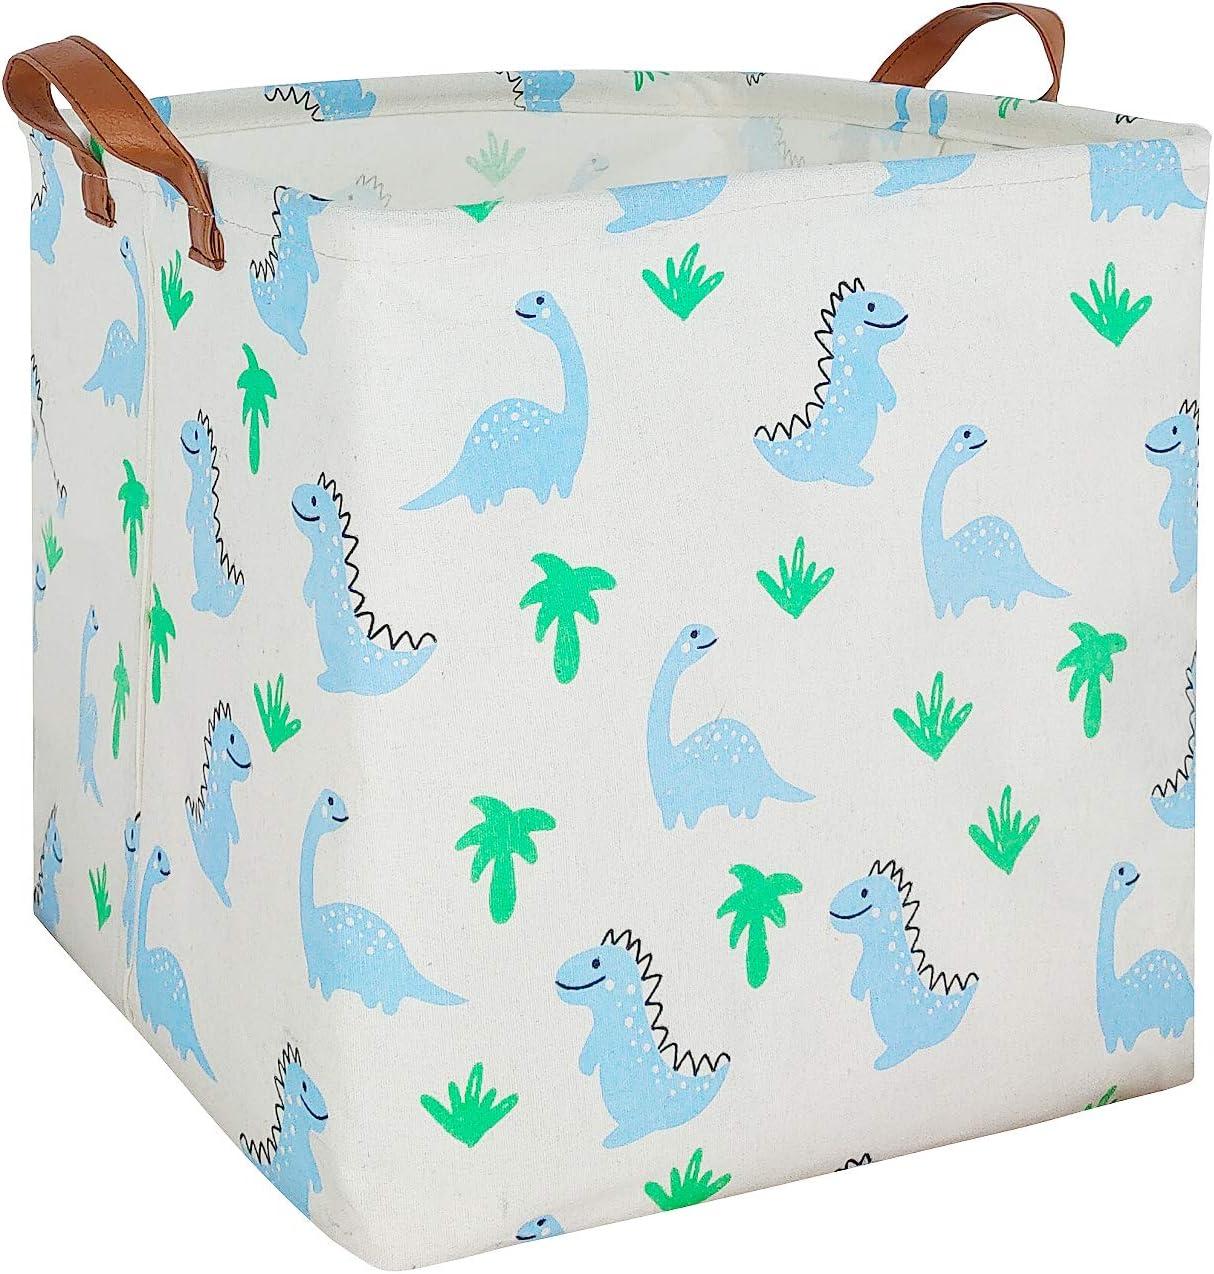 ASKETAM Square Canvas Fabric Storage Boxes,Collapsible Storage Baskets,Canvas Toy Organizer,Shelf Basket,Baby Nursery,Gift Baskets, Closet & Laundry,Room Decor (Blue Dinosaur)